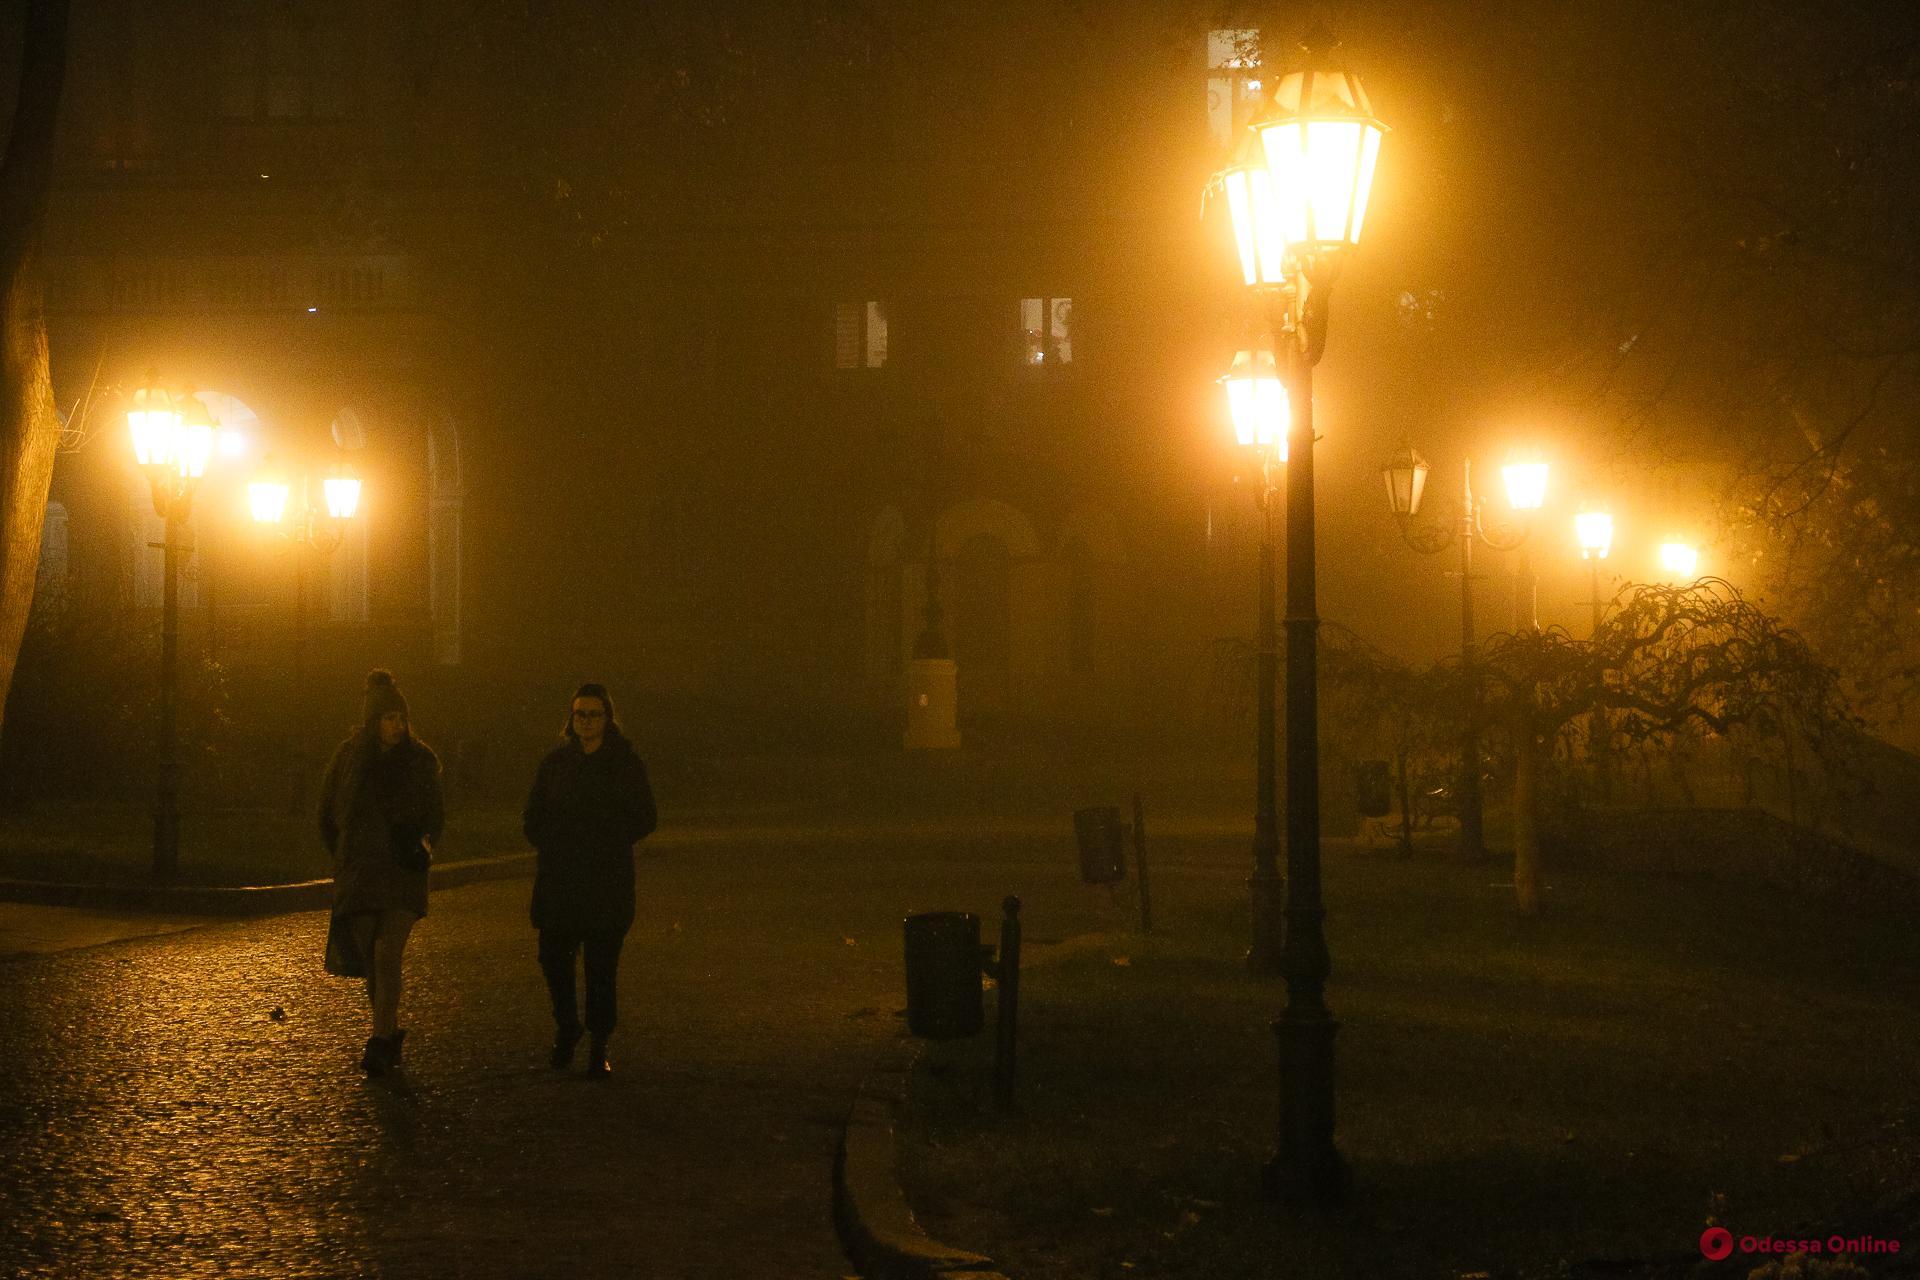 Вечерняя Одесса в тумане (фоторепортаж)